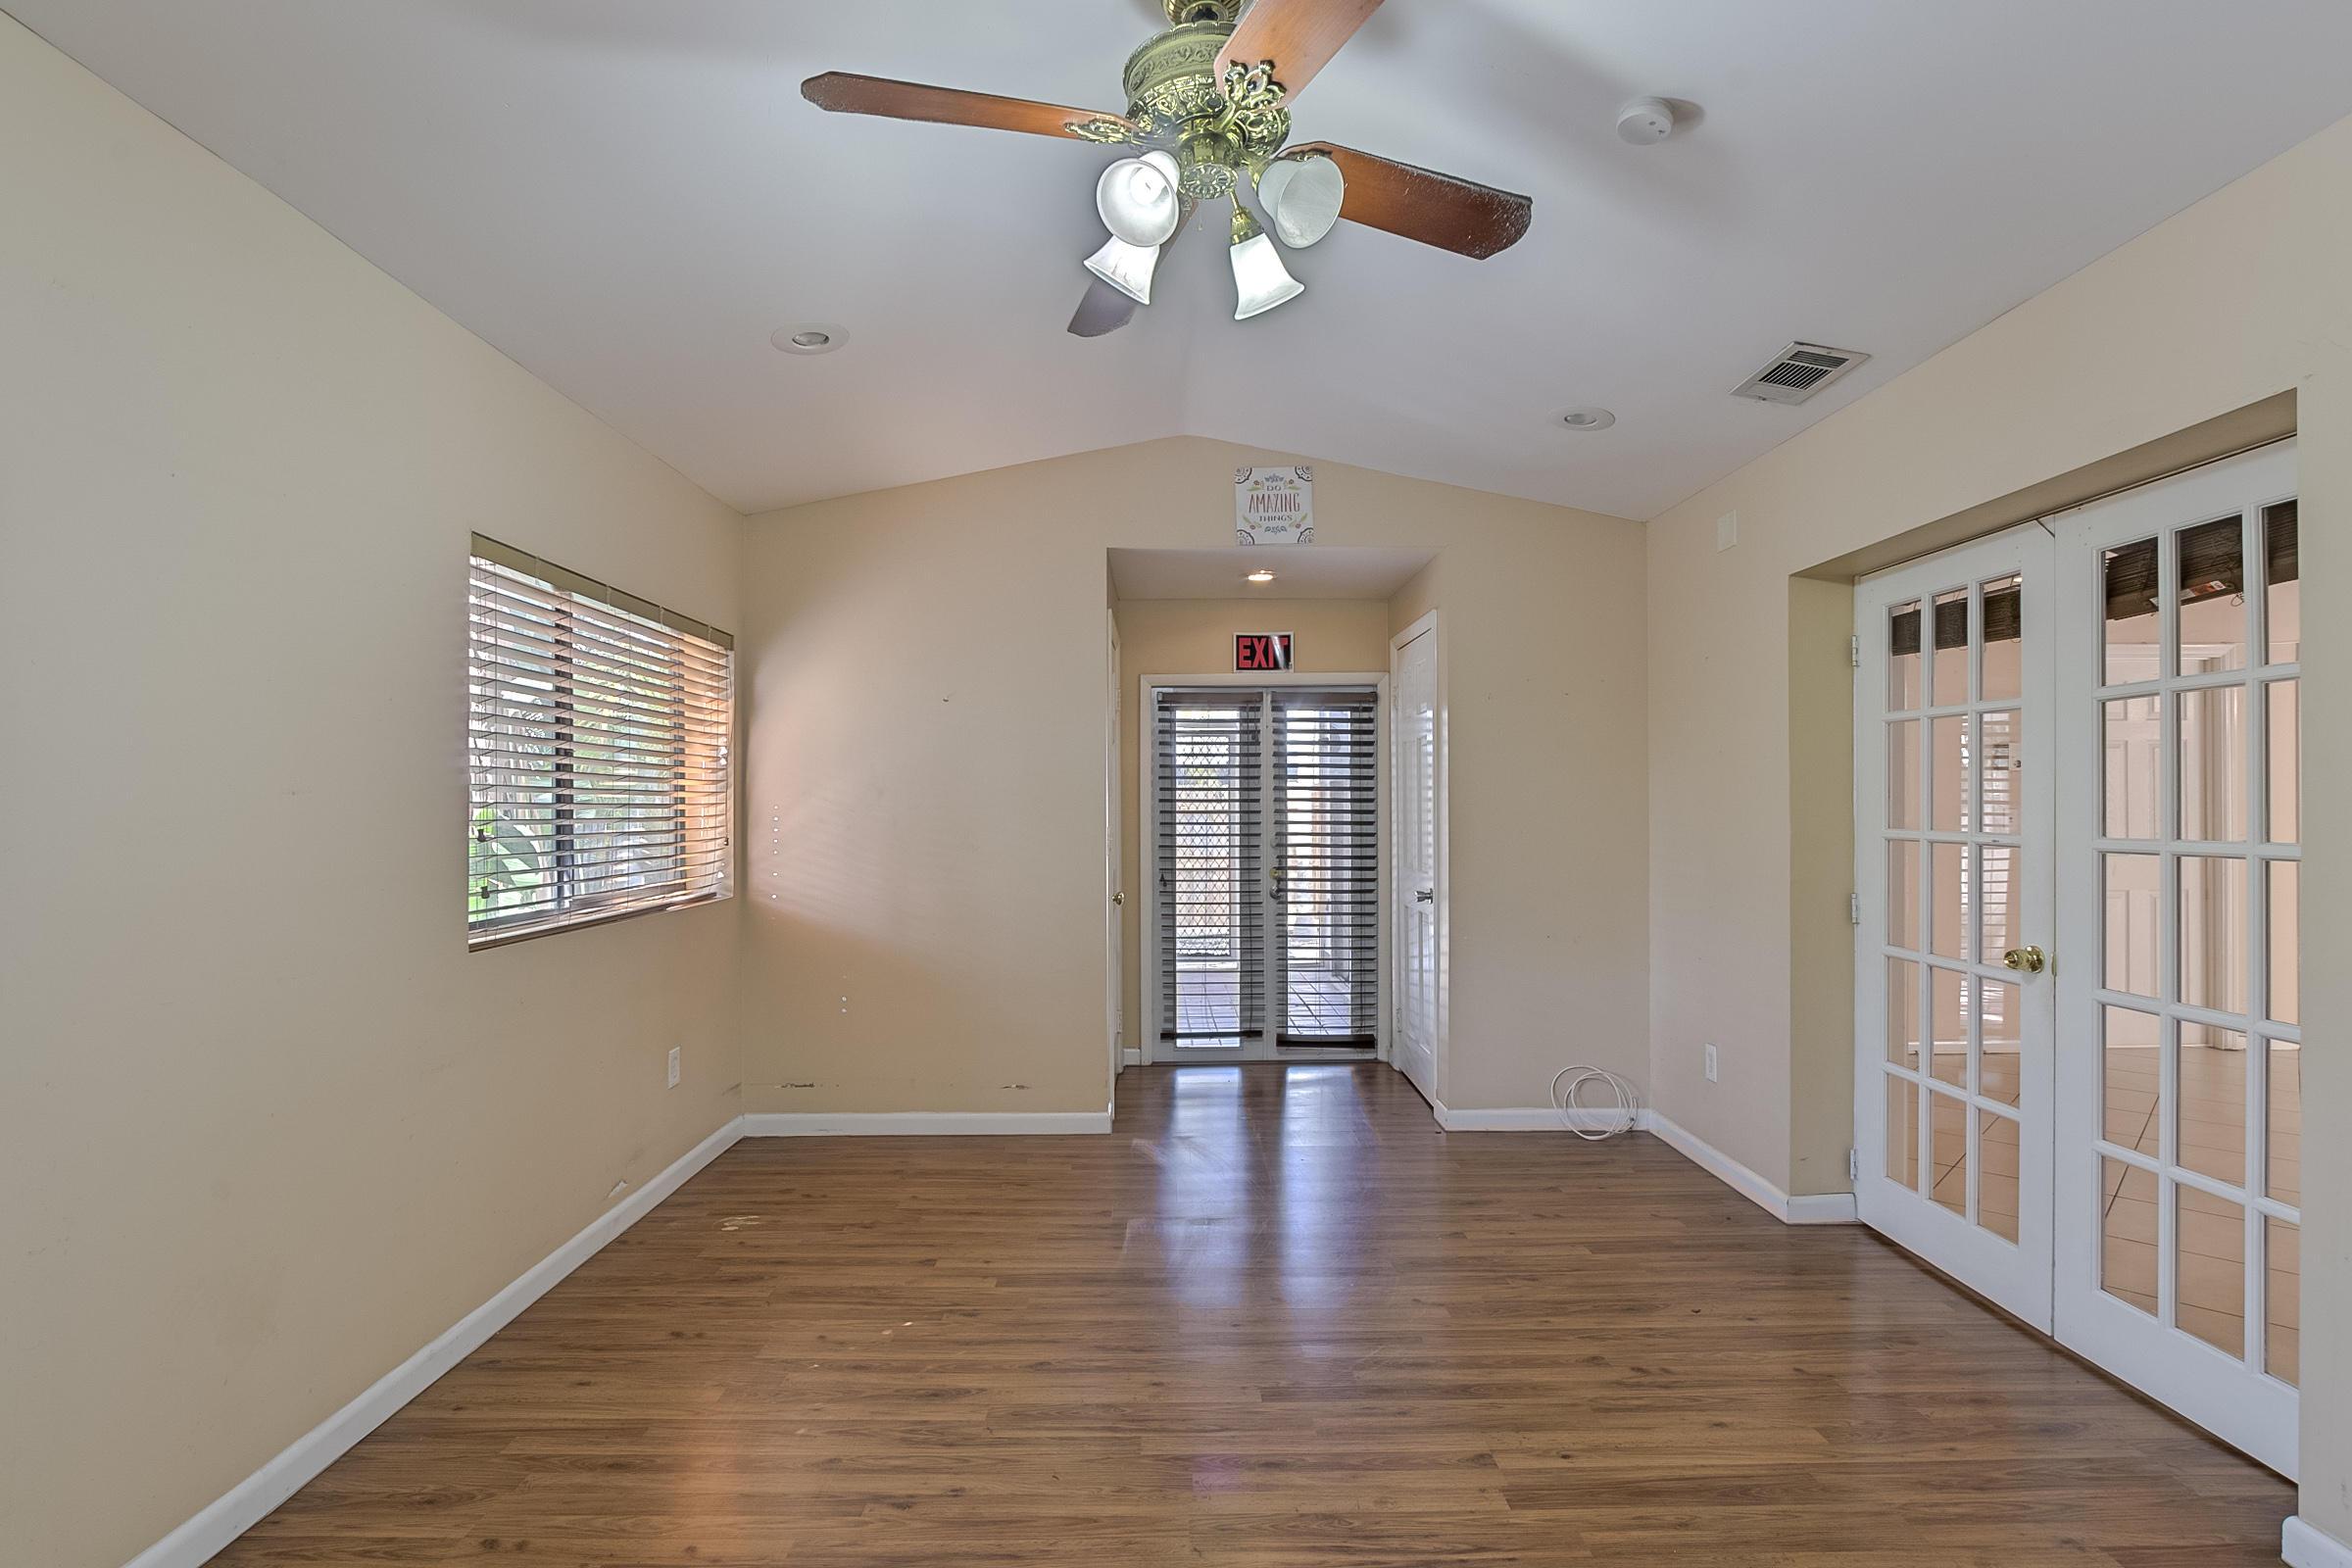 2417 Sundy Ave, Delray Beach, FL 33444